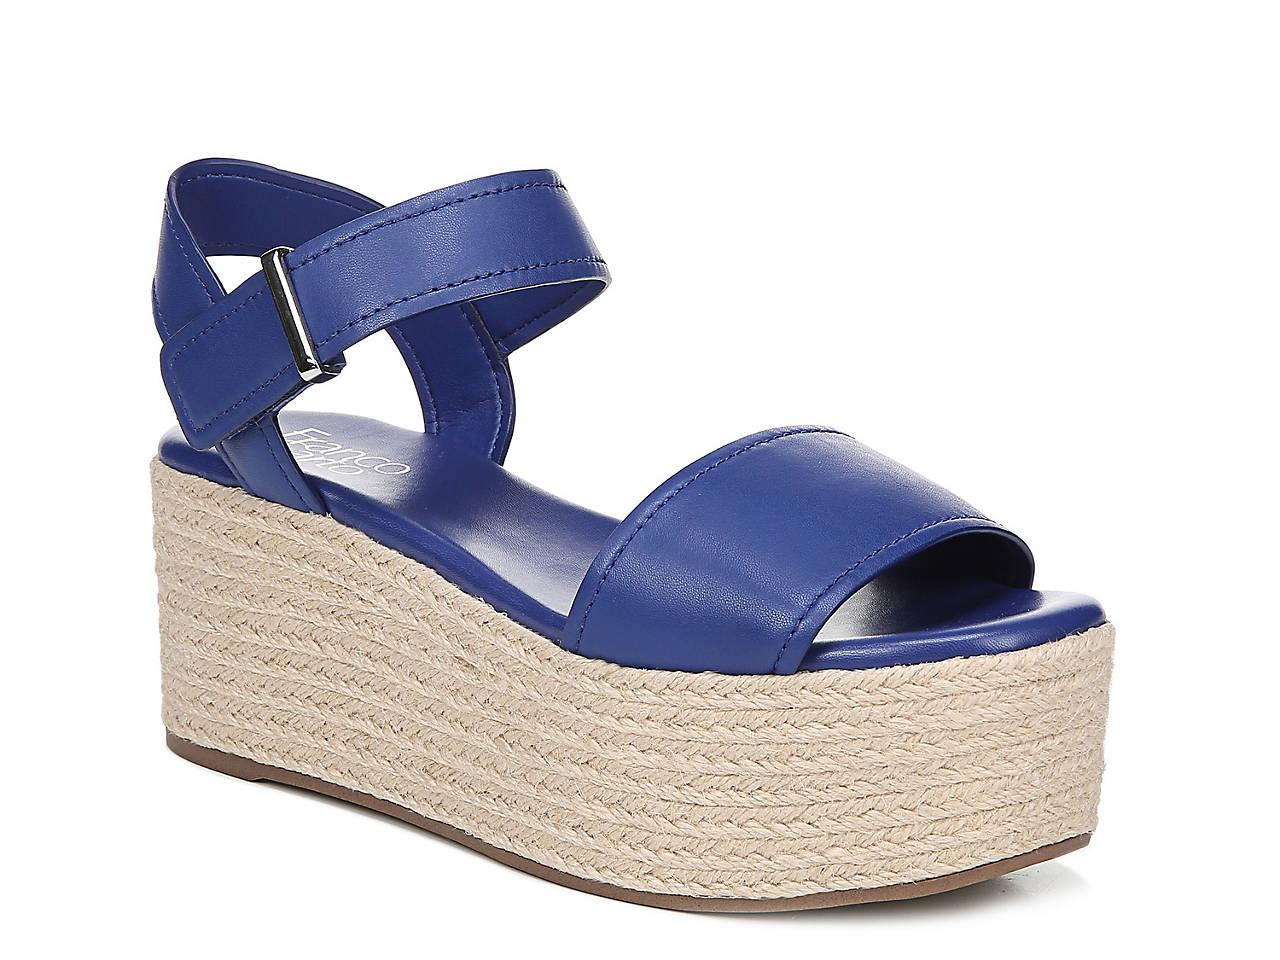 70c37a3dfac Ben Espadrille Platform Sandal